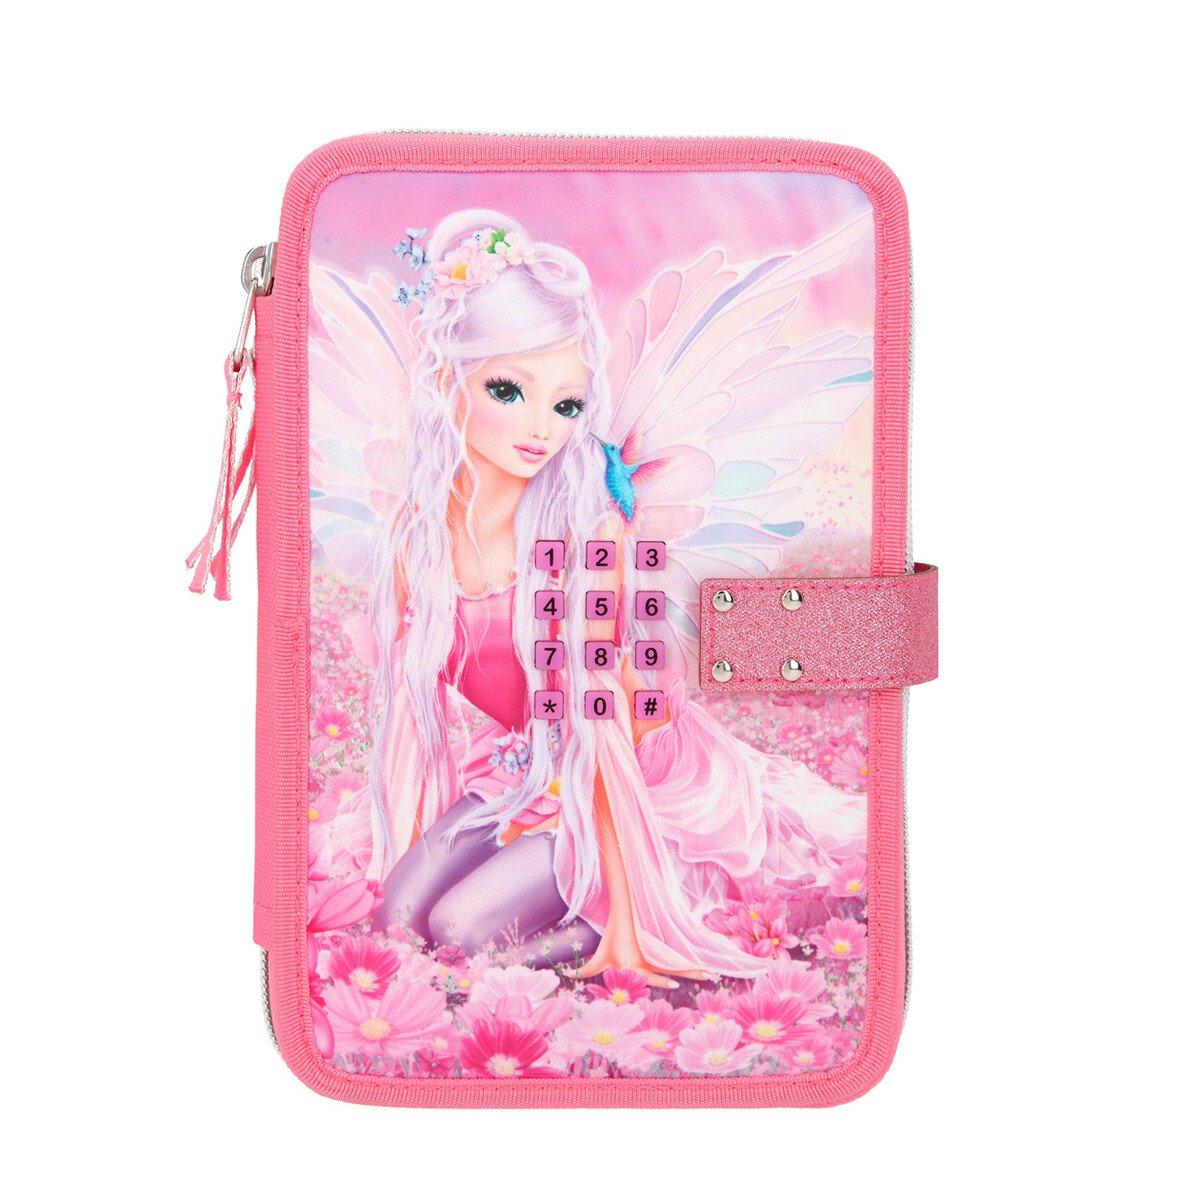 Top Model - Fantasy Model - Pencil Case w/Code & Light - Fairy (0411196)